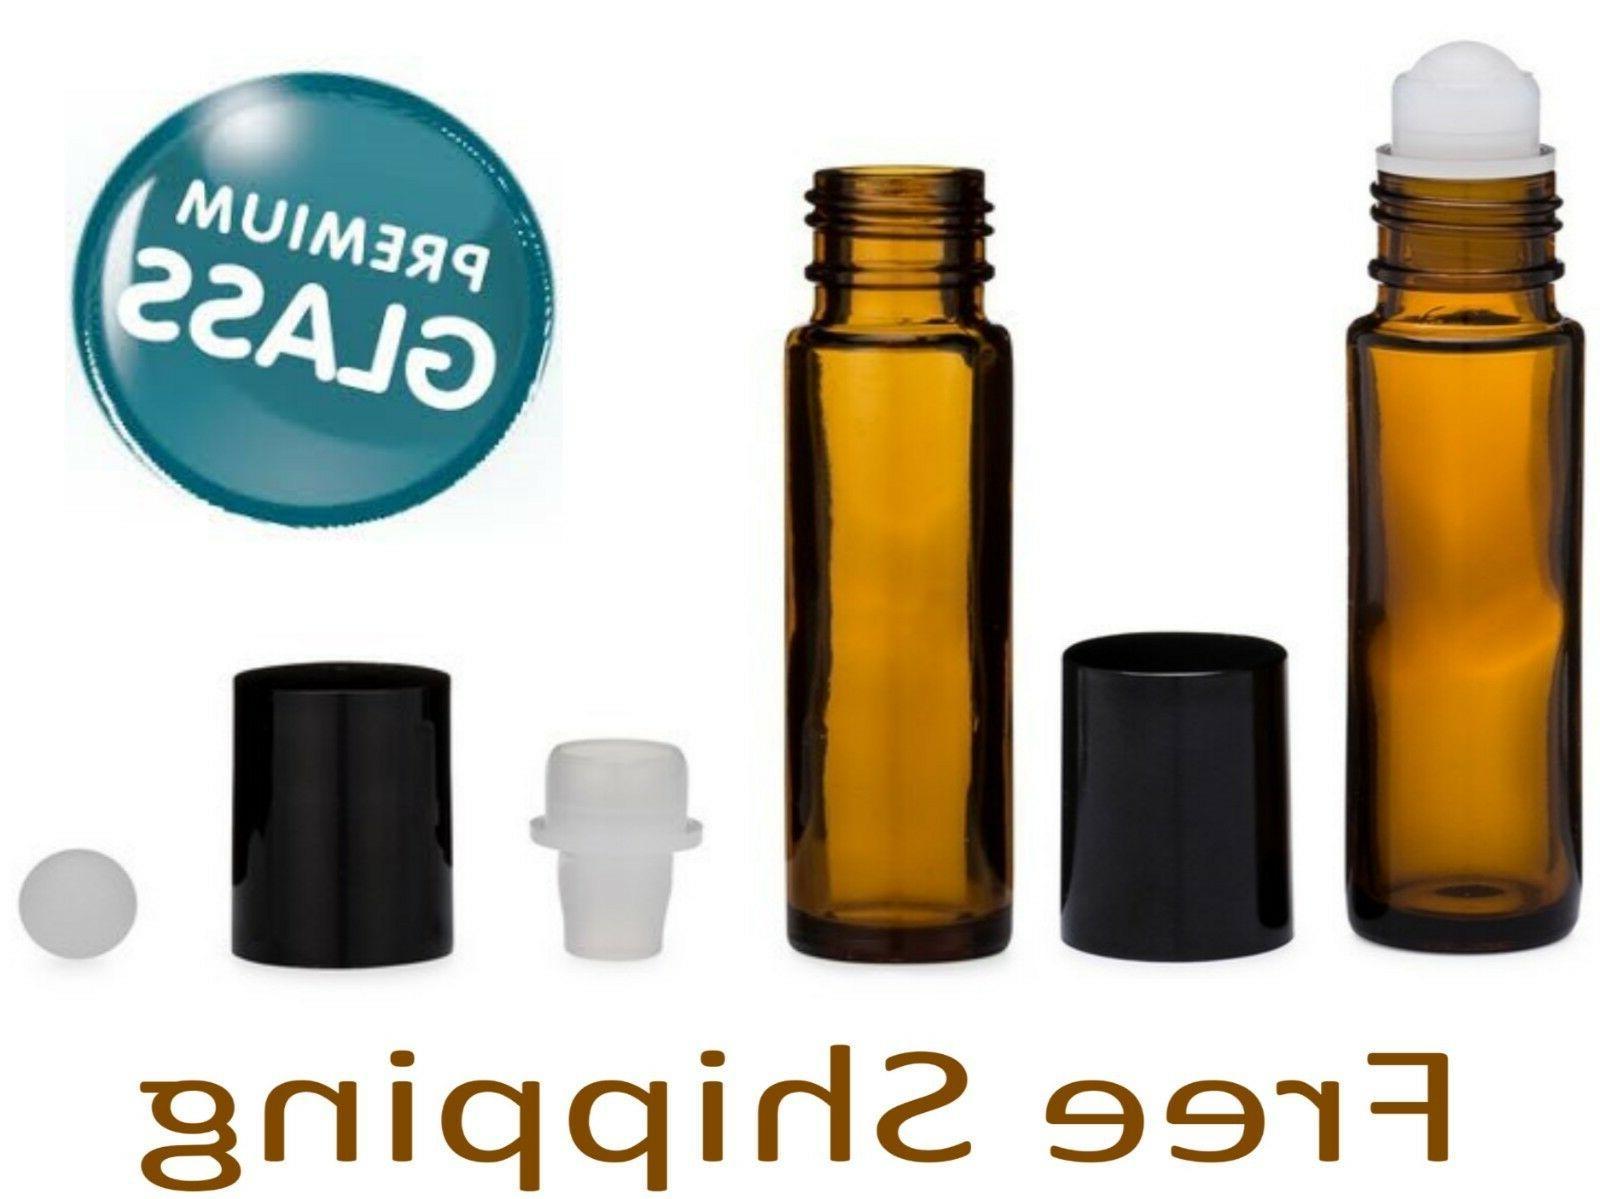 Essential Oil Amber Glass Roll on Roller Bottles 10ml Empty